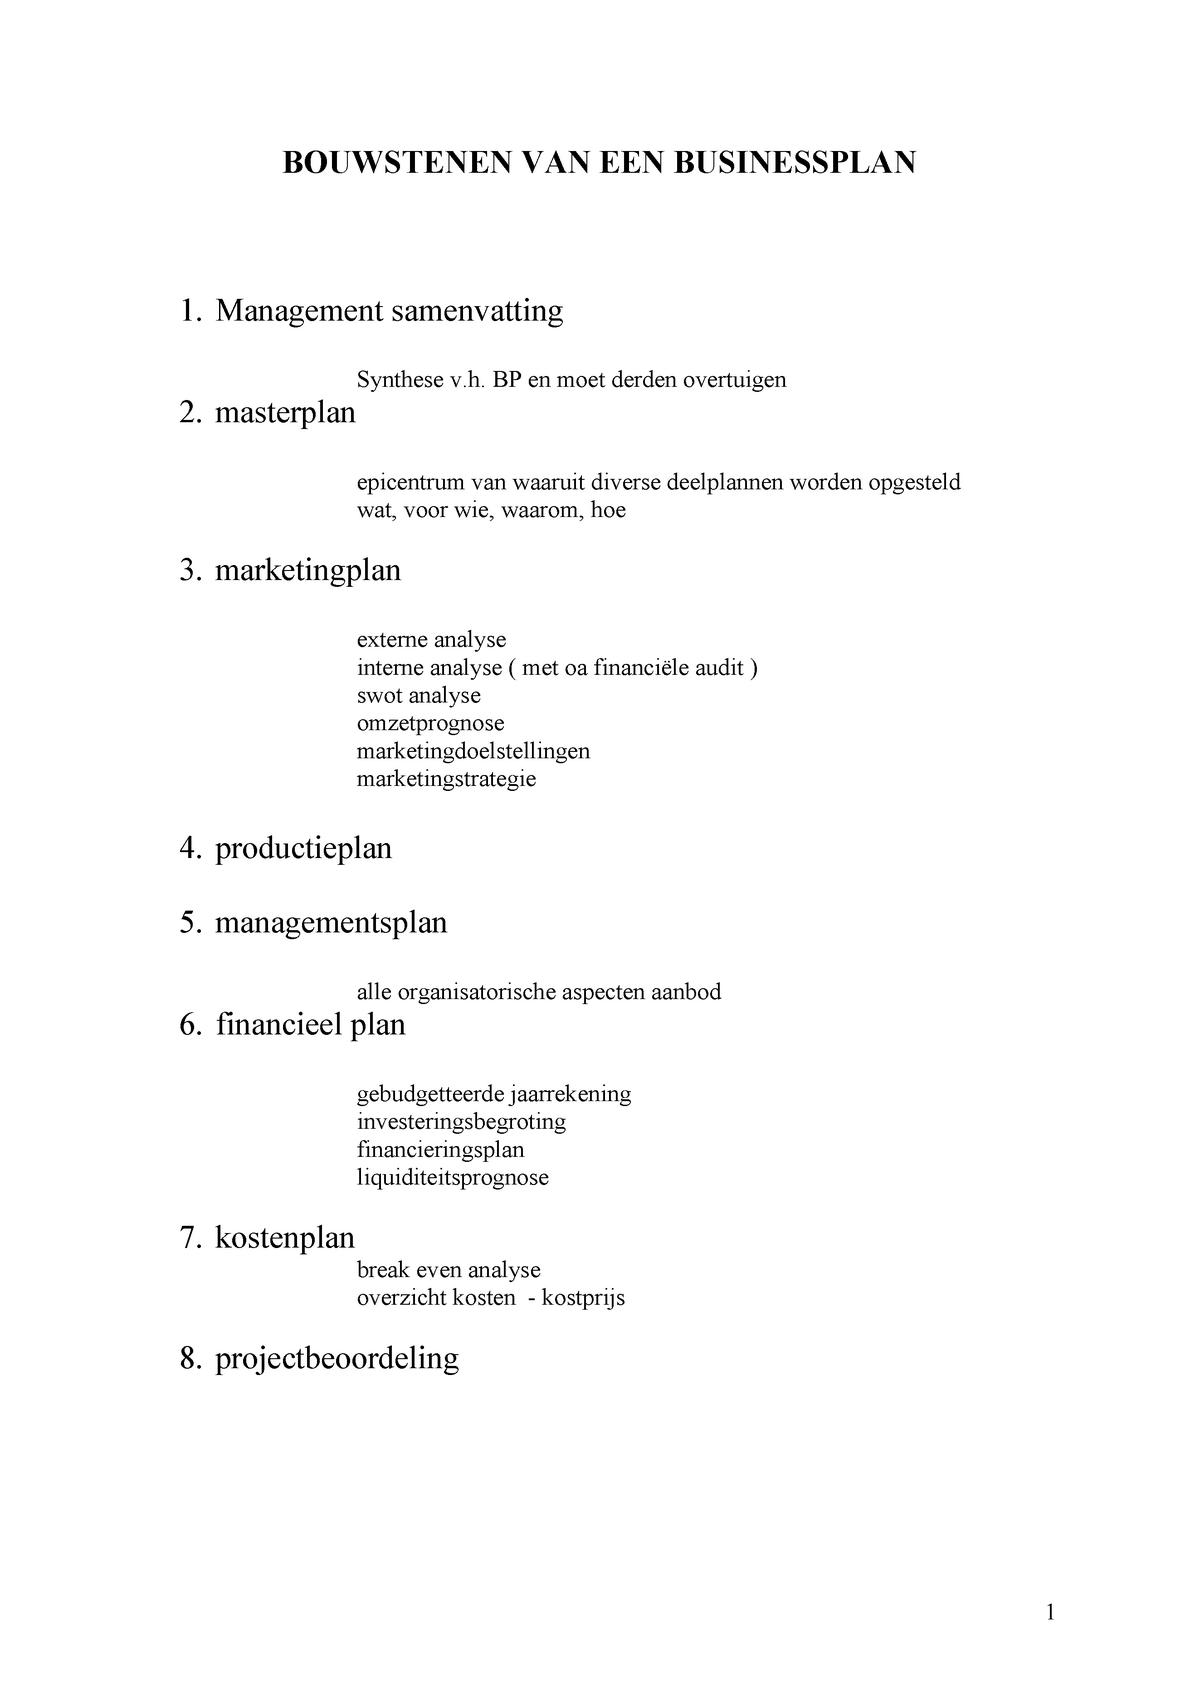 258420a887e755 Samenvatting - Inleiding budgettering - Cost accounting - StuDocu